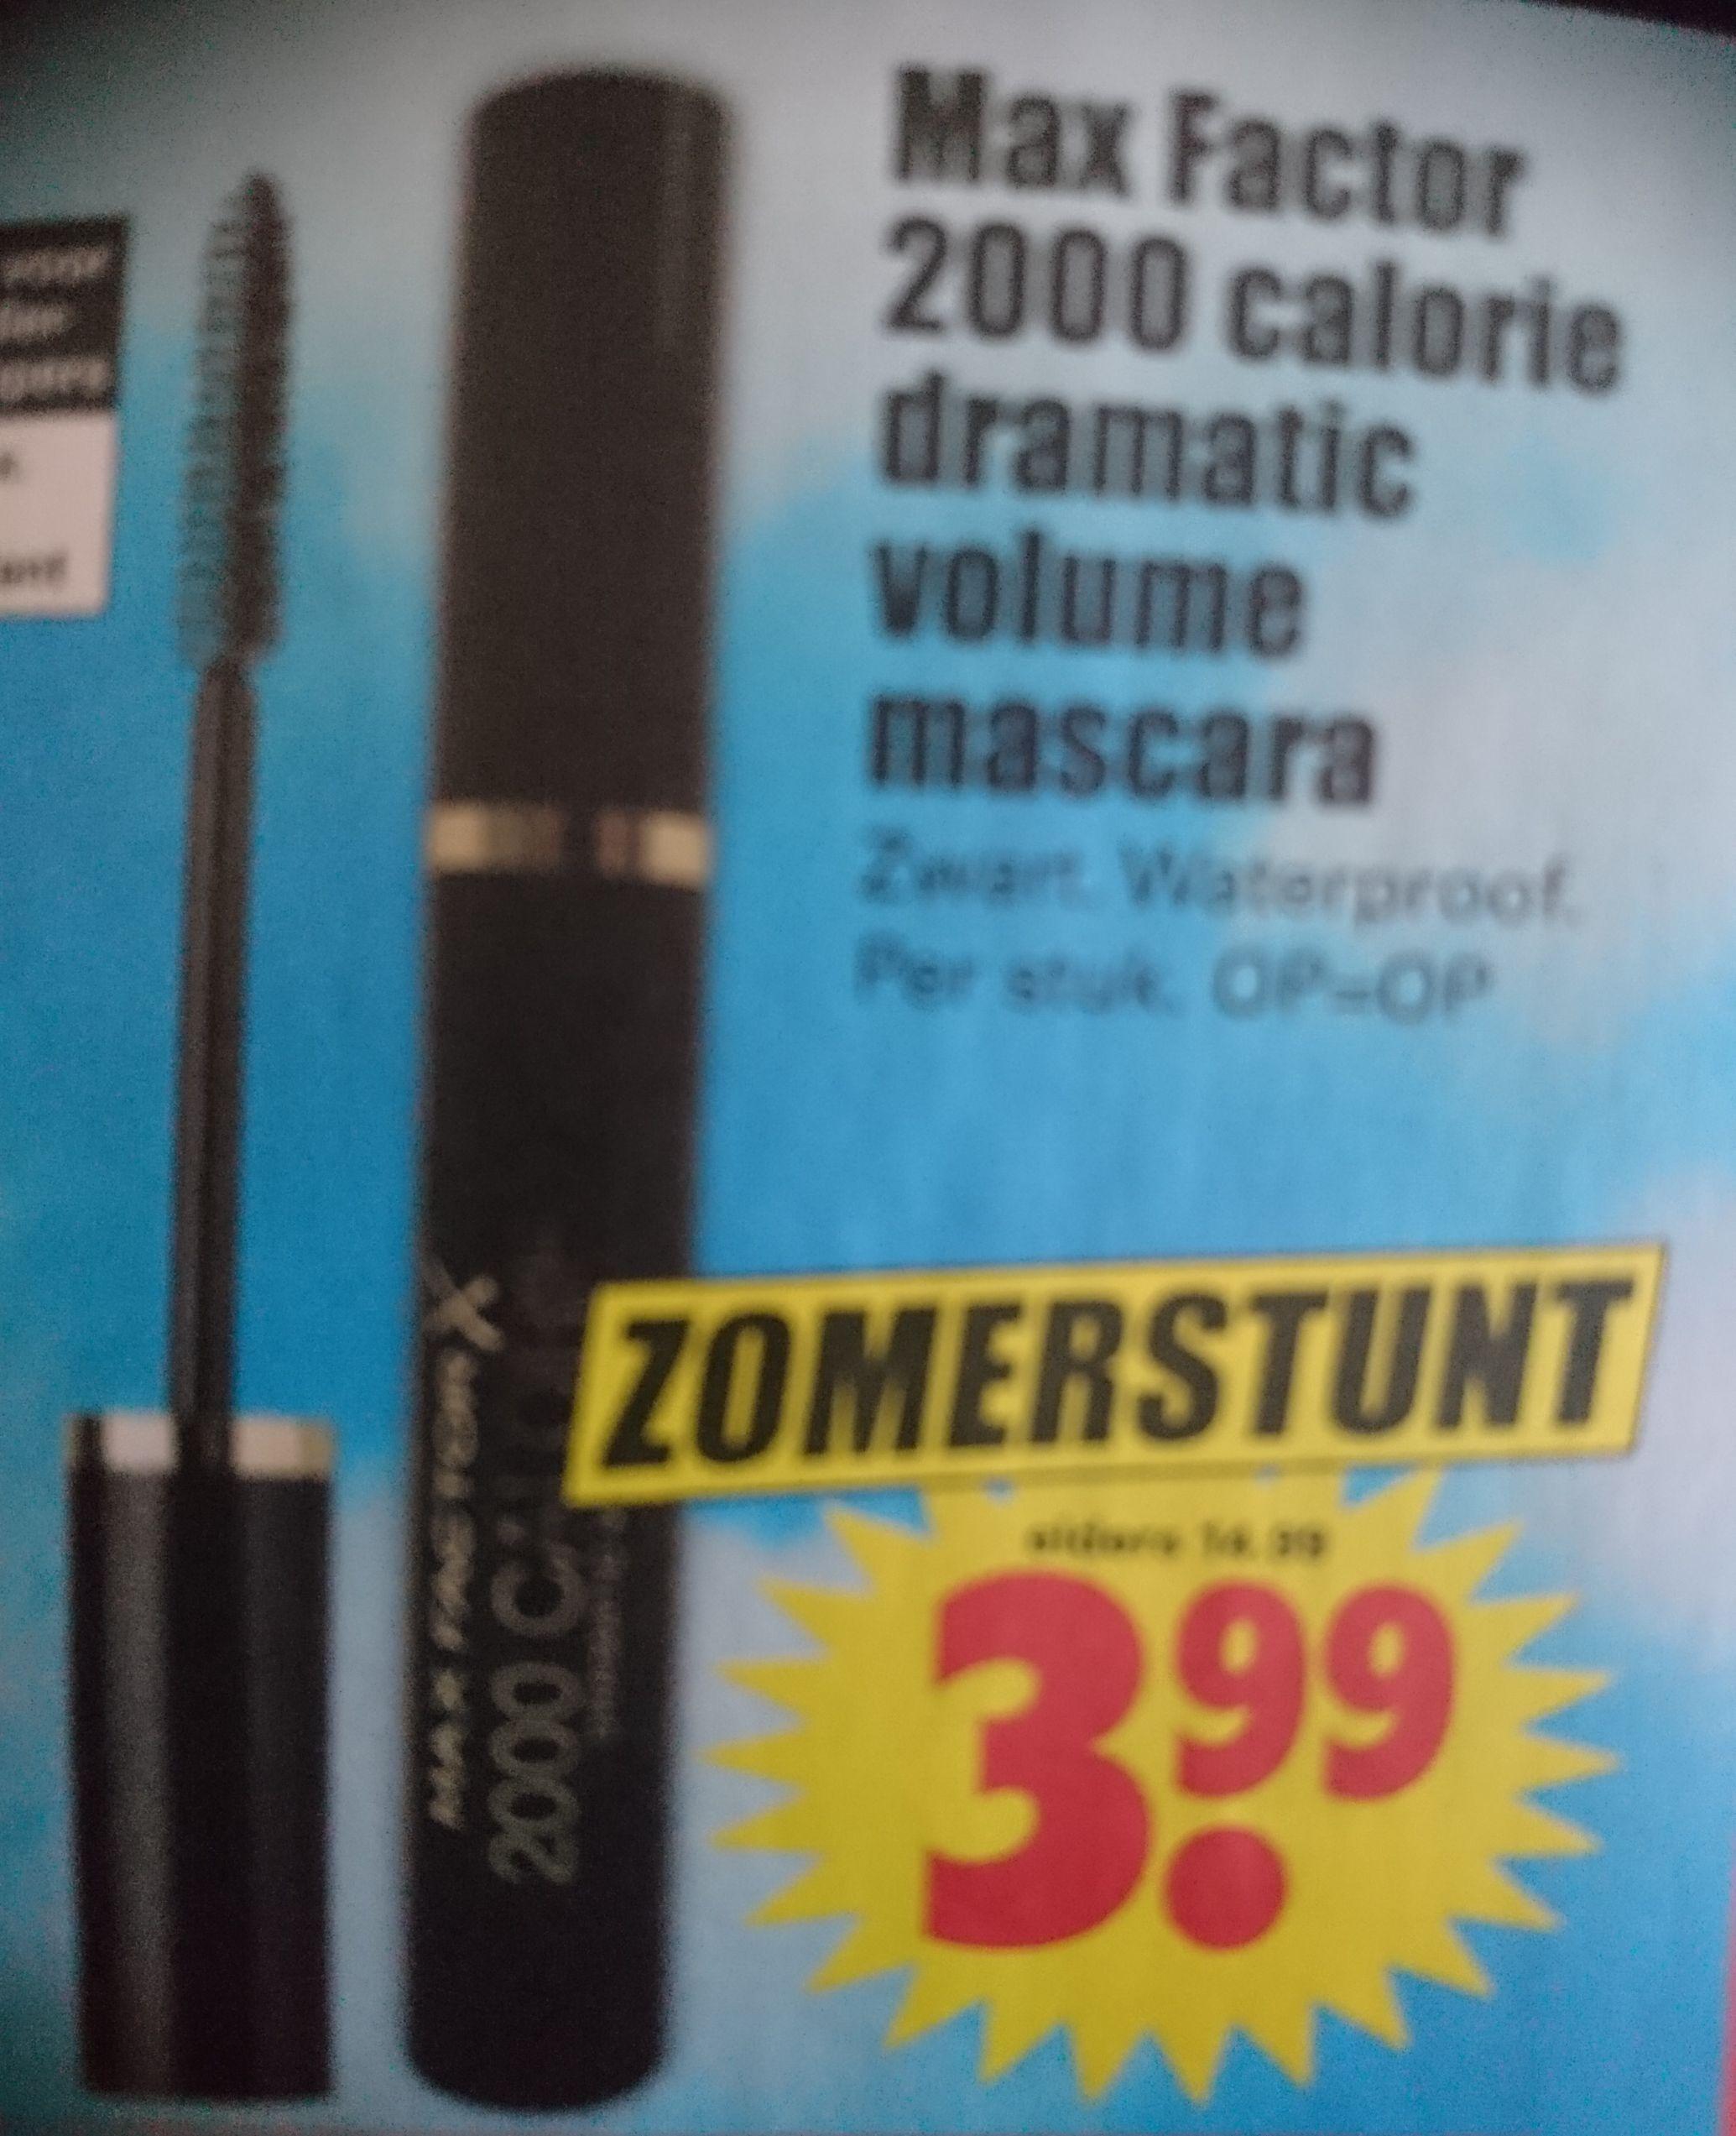 Max factor 2000 Calorie dramatic Volume Mascara